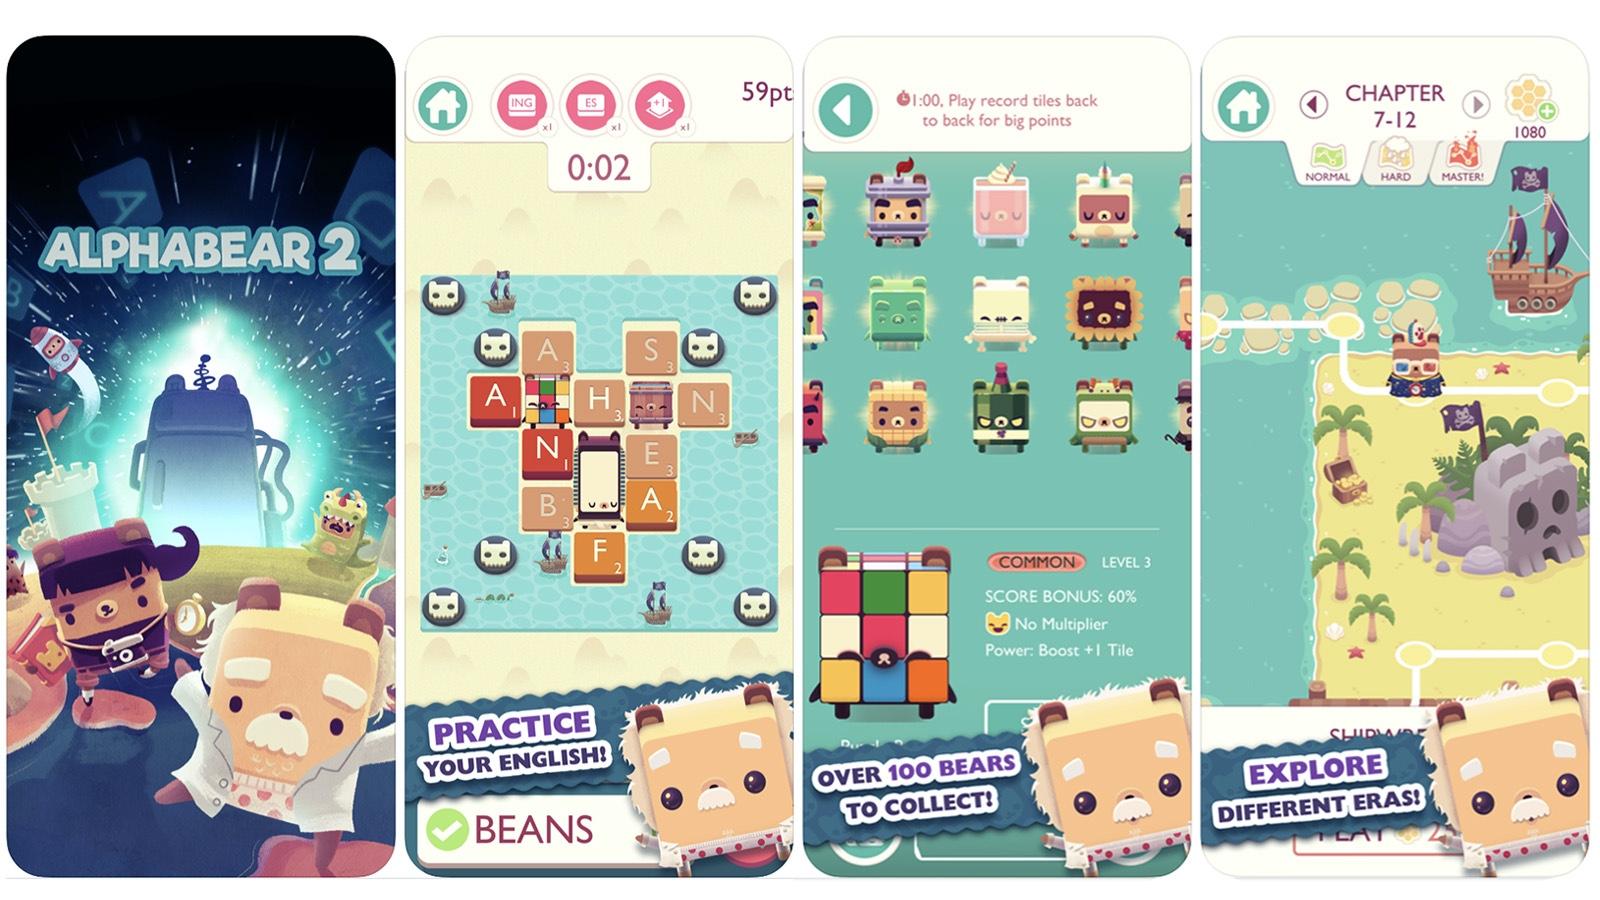 Alpha Bear 2 game screenshot